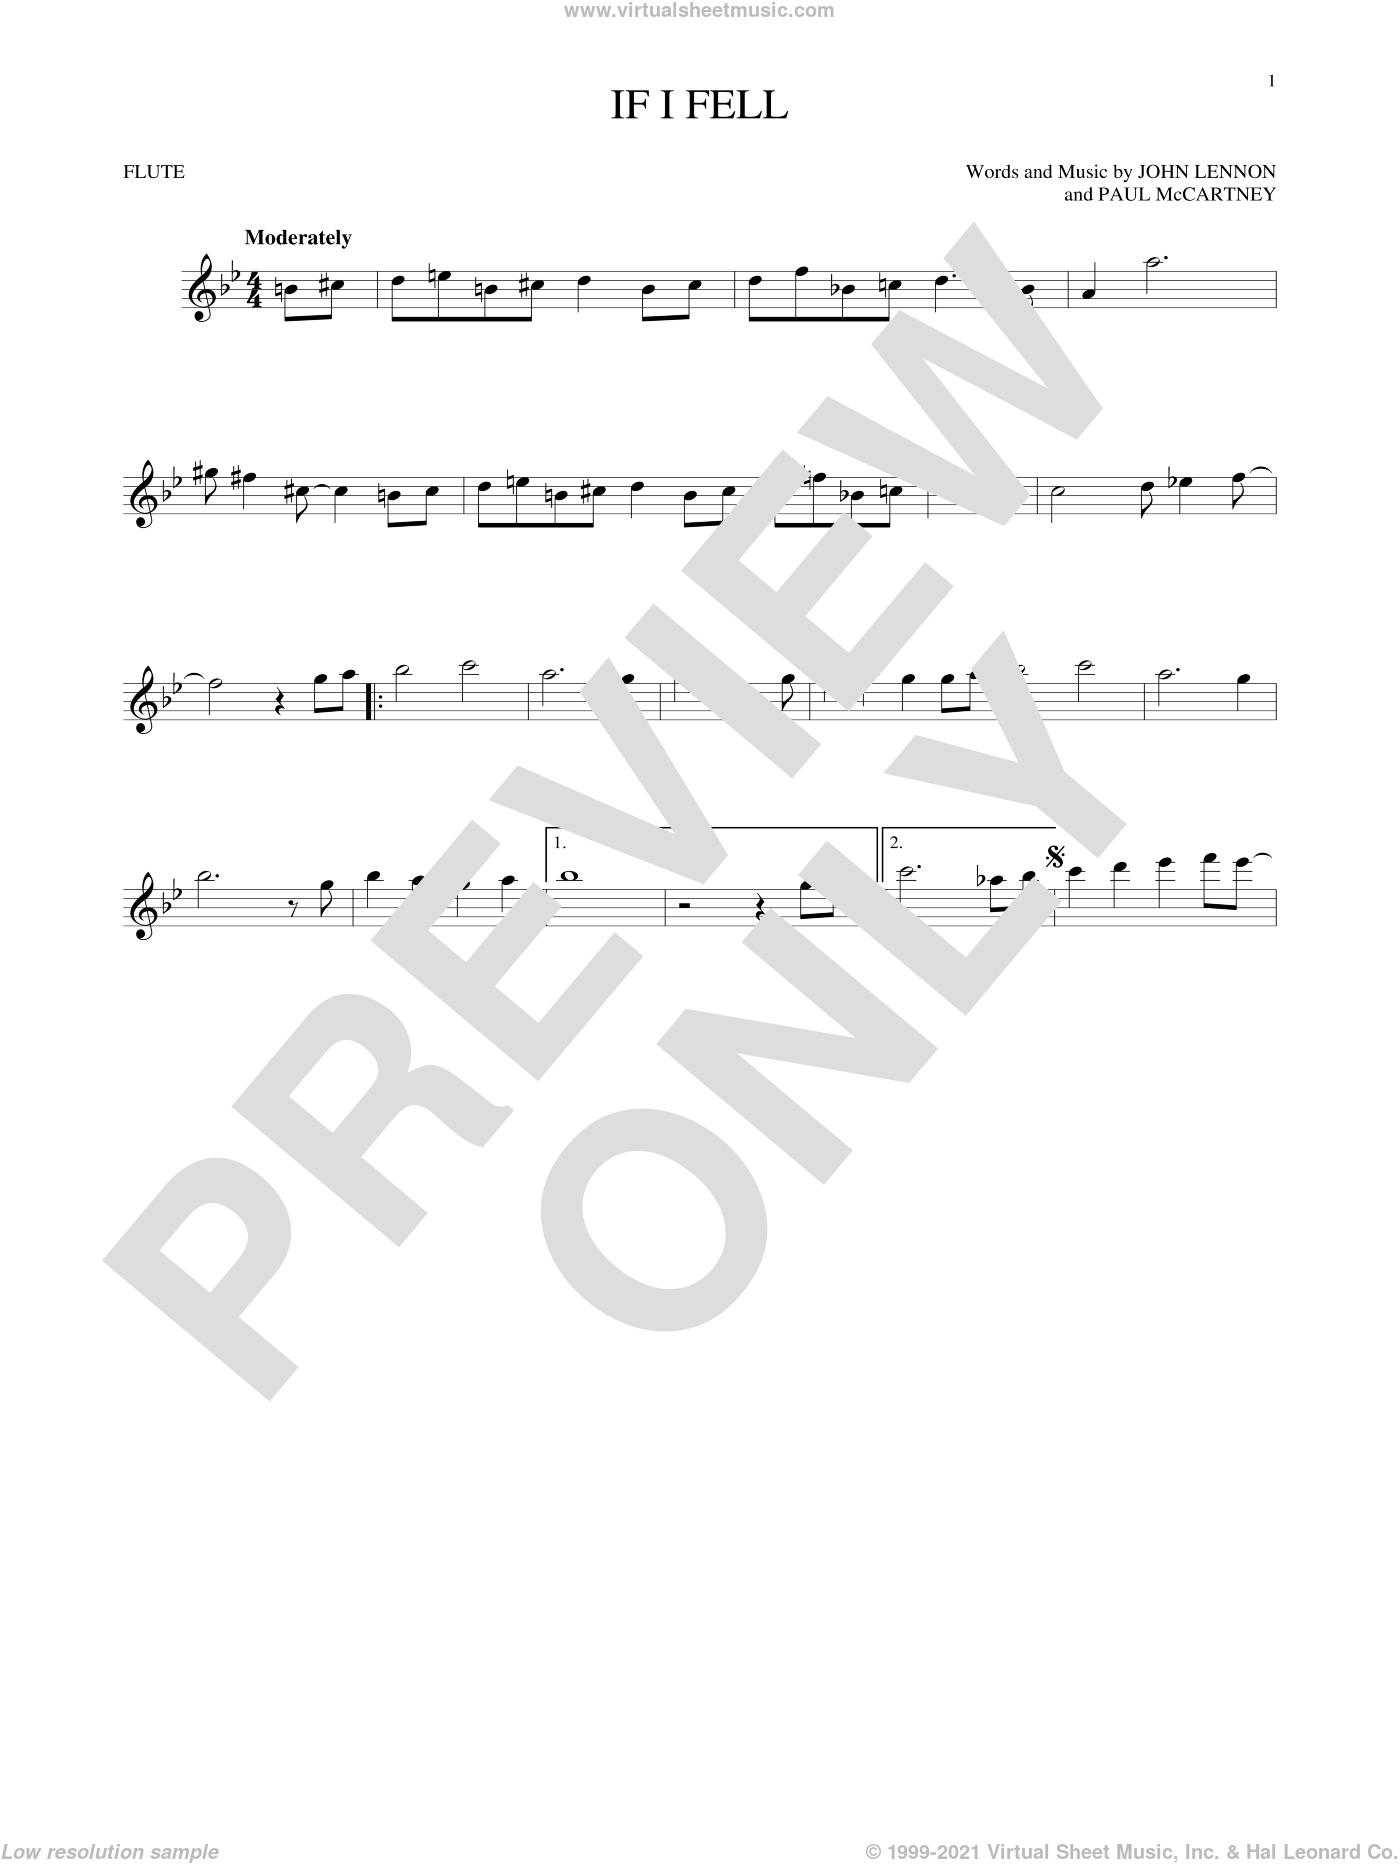 If I Fell sheet music for flute solo by The Beatles, John Lennon and Paul McCartney, intermediate skill level